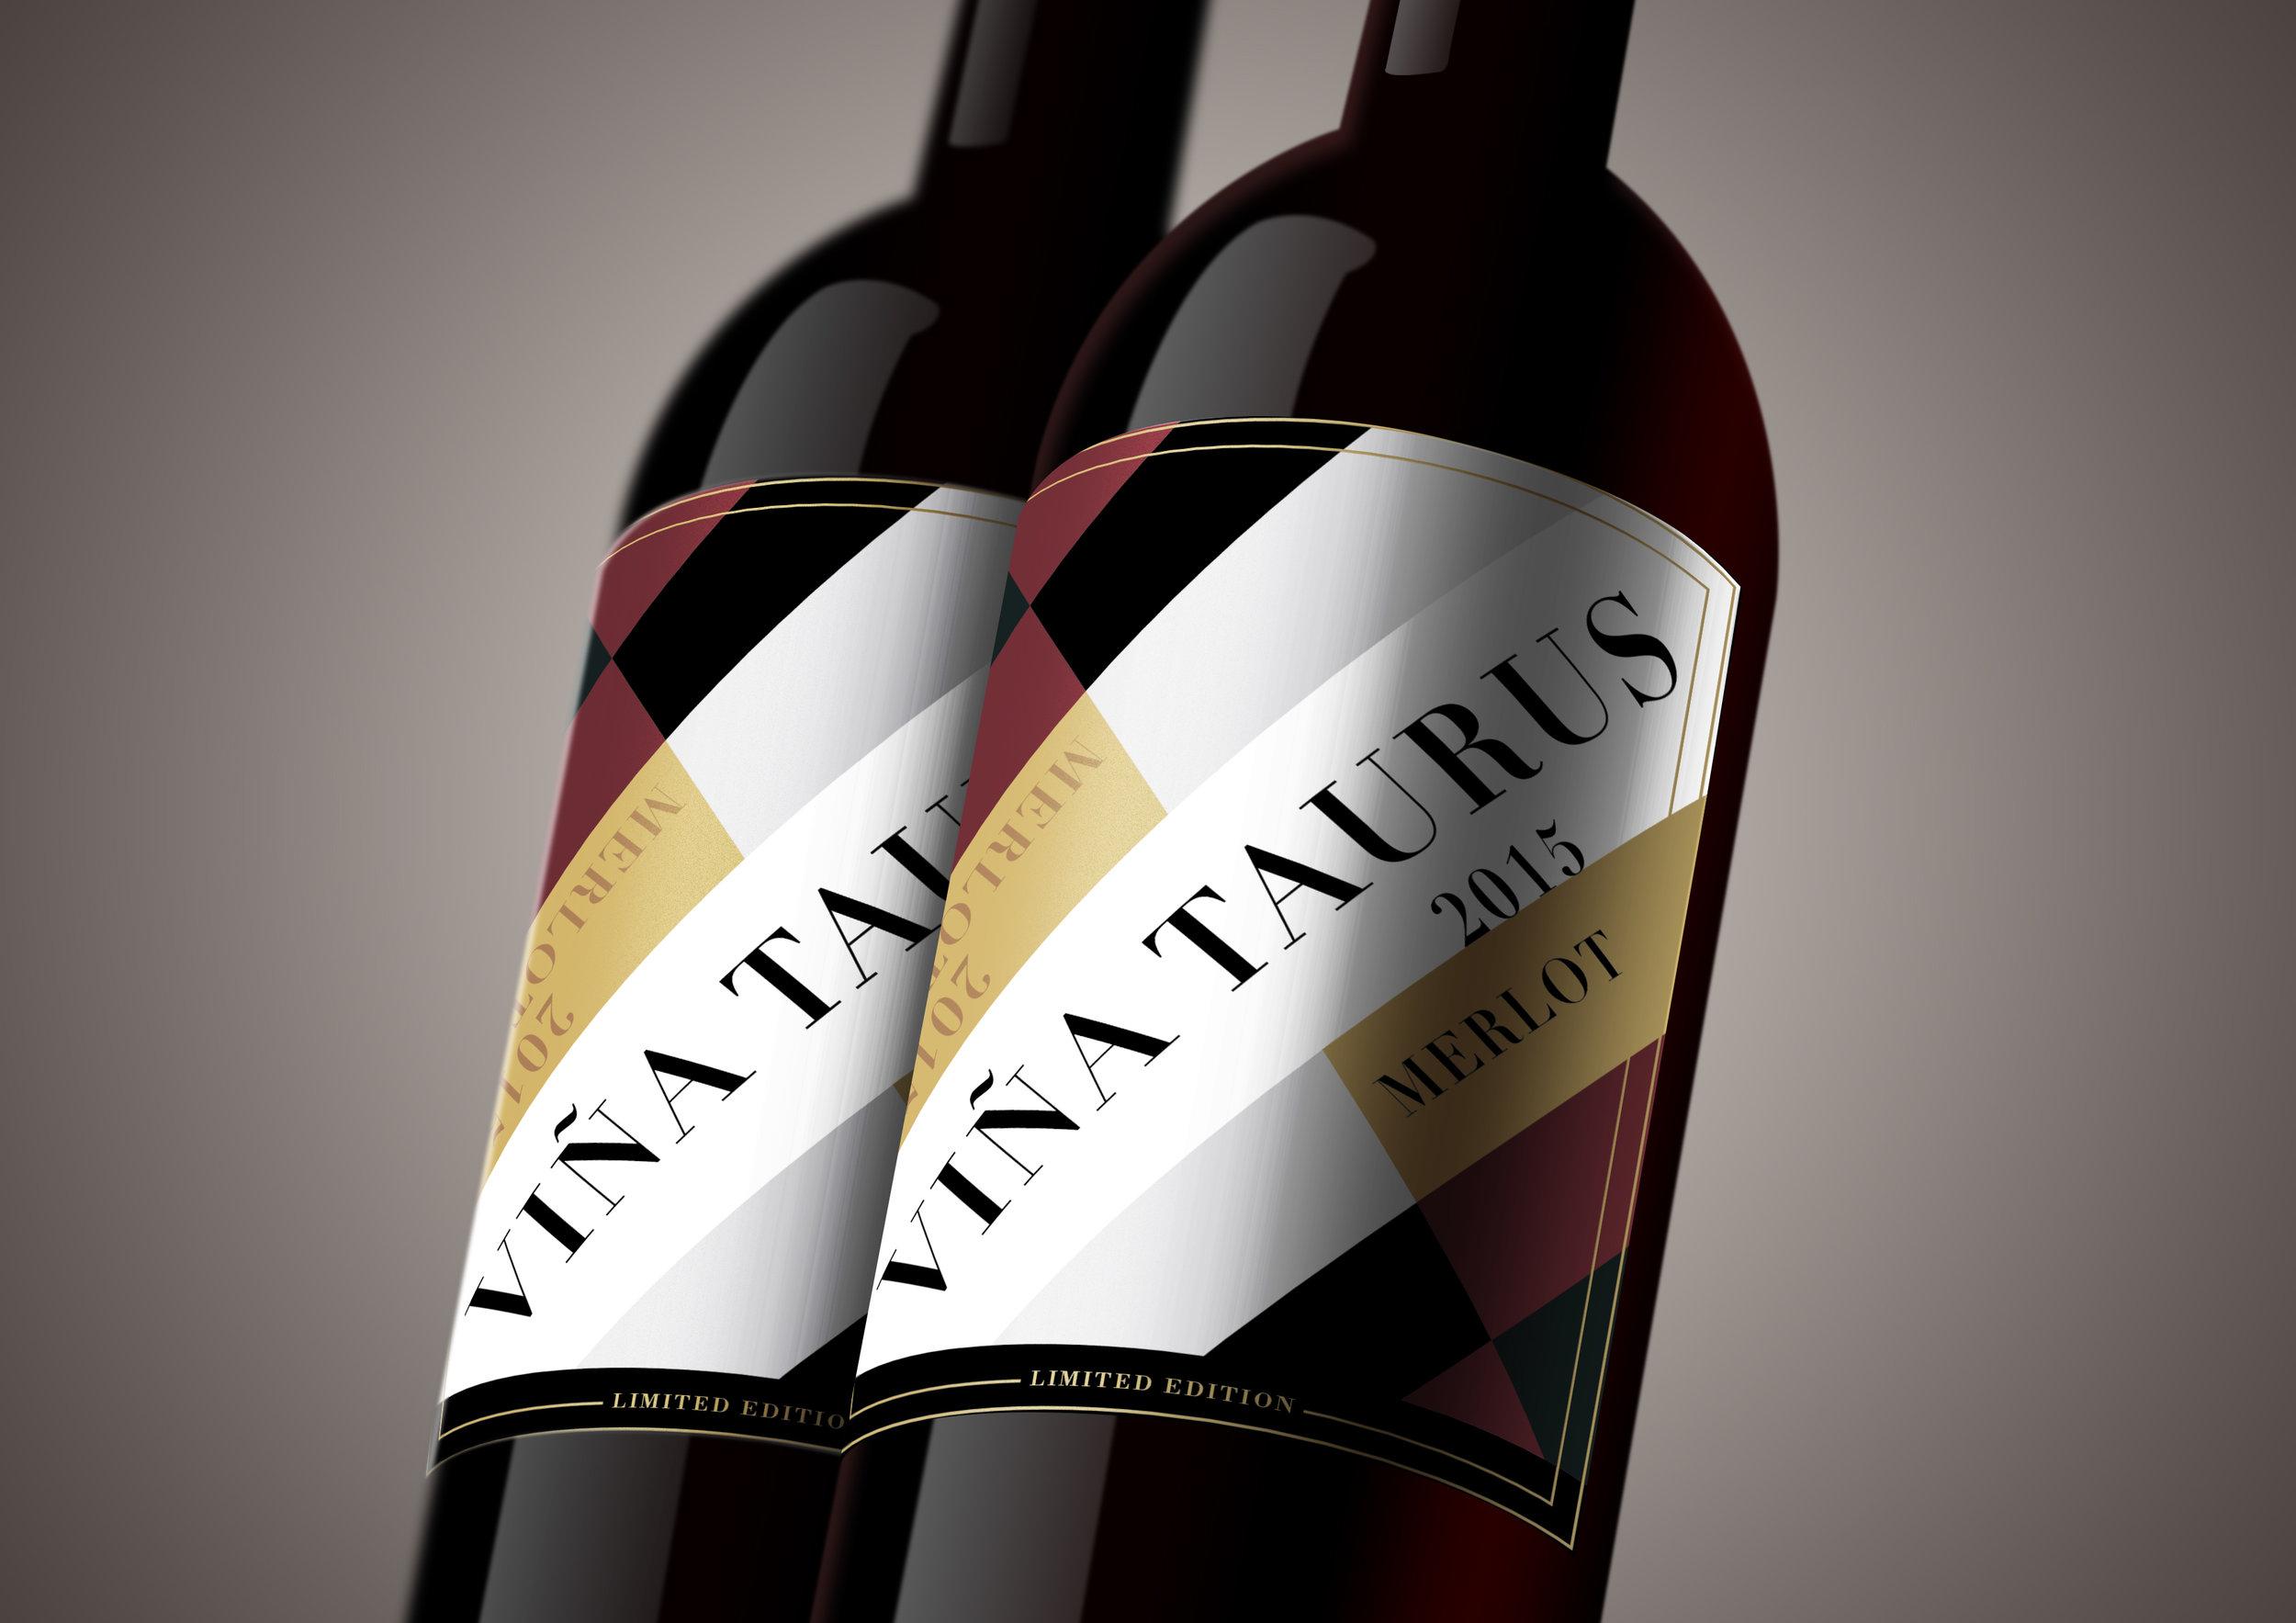 vina taurus 2 bottle shot.jpg